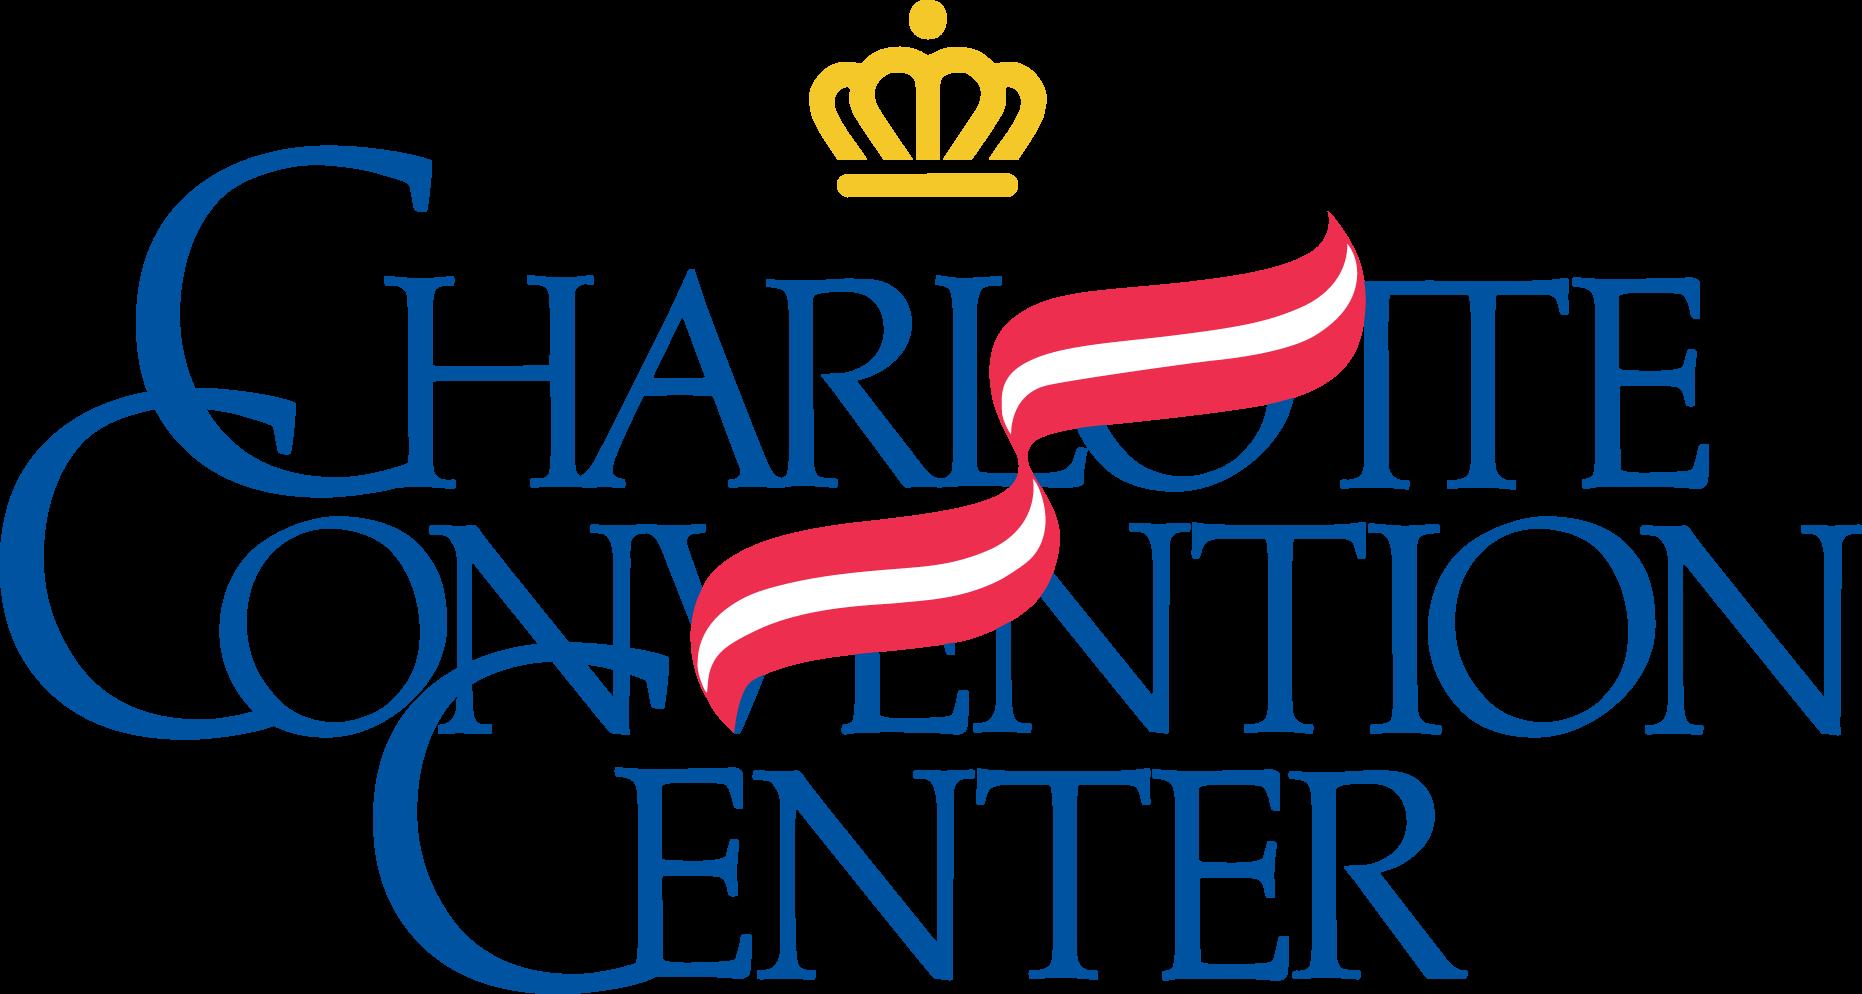 Charlotte Convention Center Logo